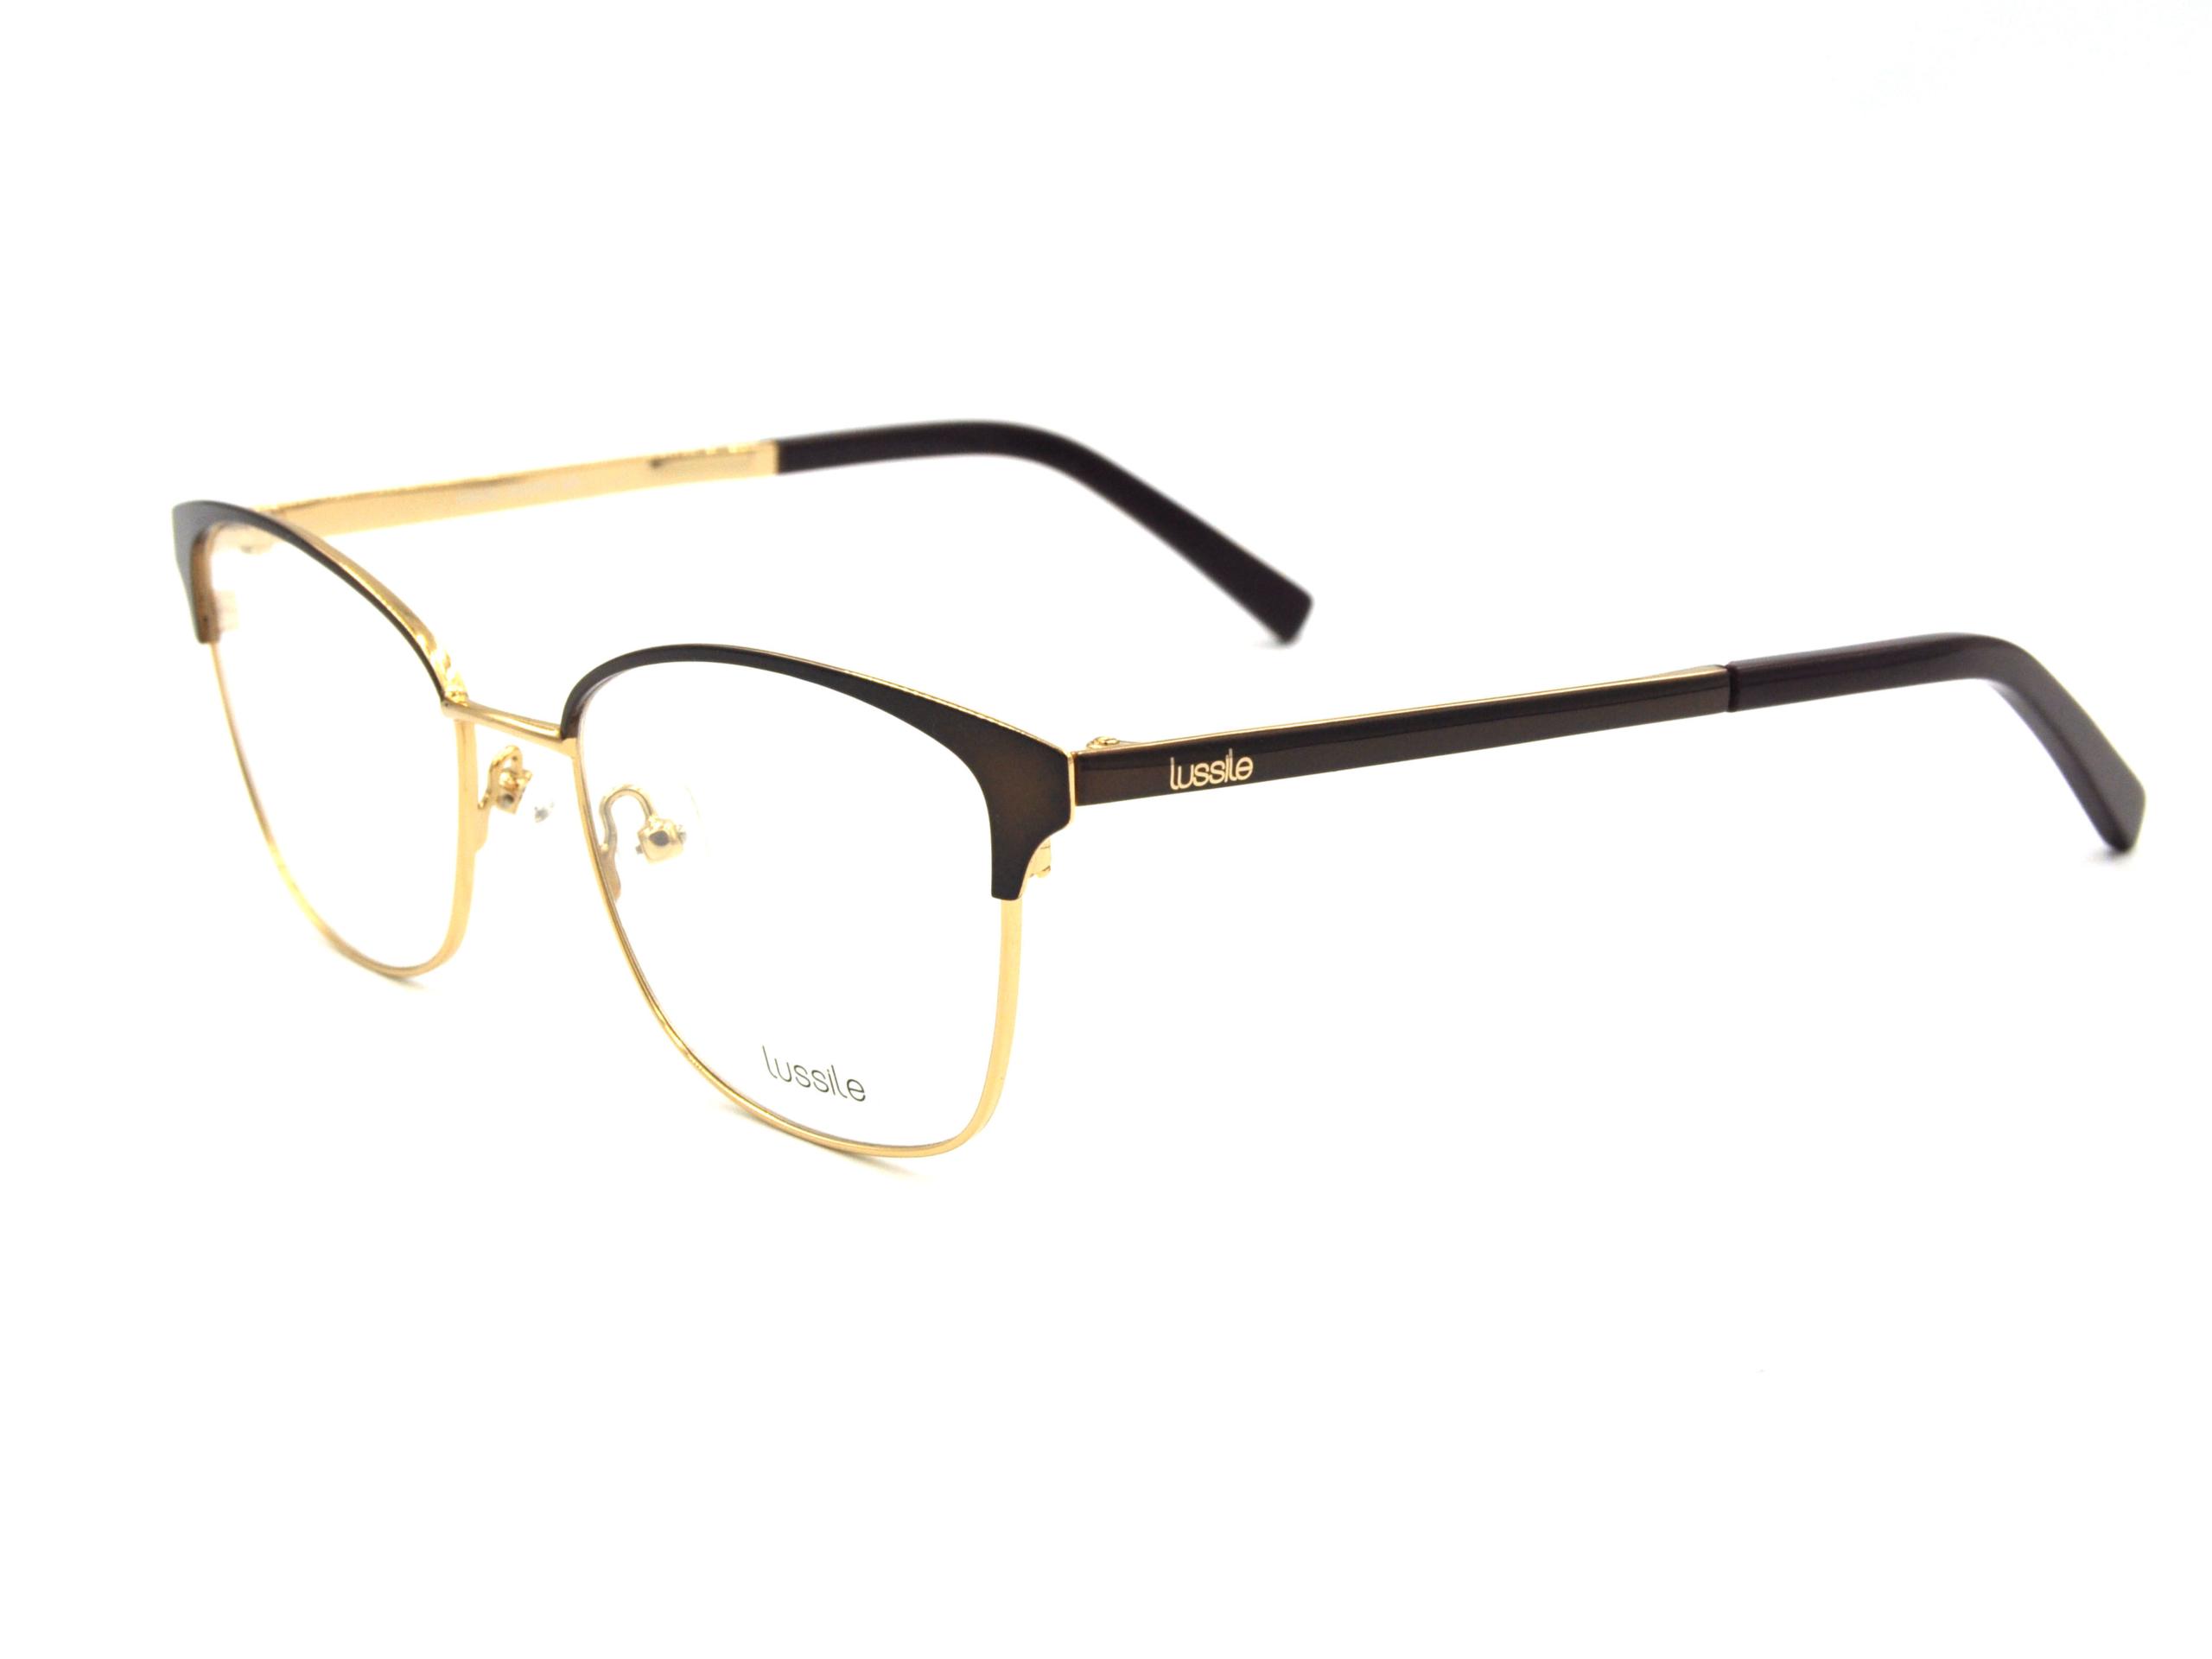 Lussile ls32211 LJ06 Prescription Glasses 2020